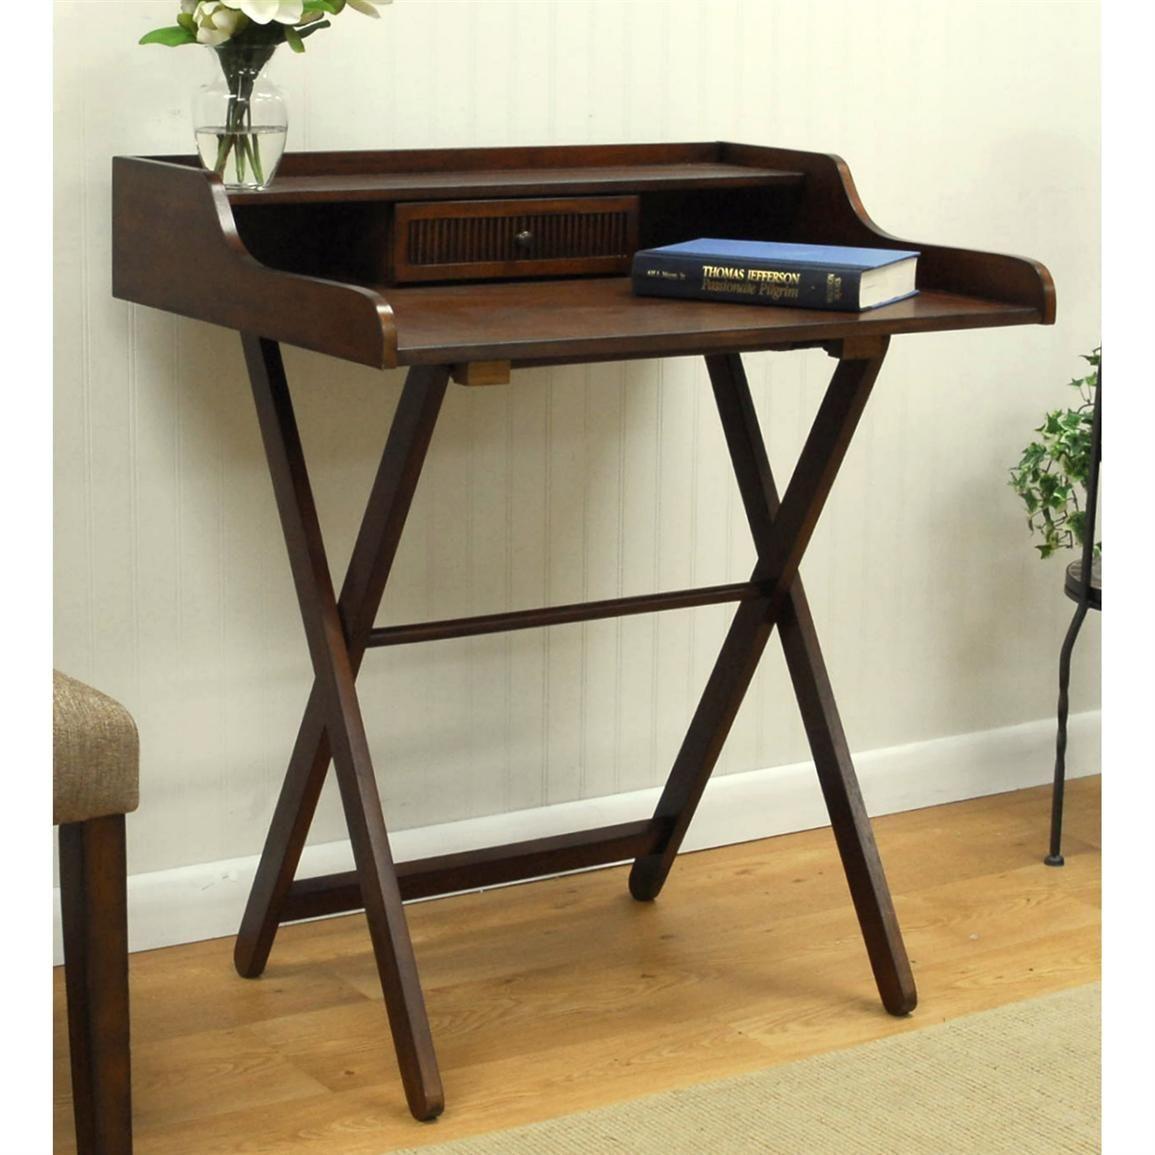 foldable desk for small apartment foldable desk dark color design rh pinterest com